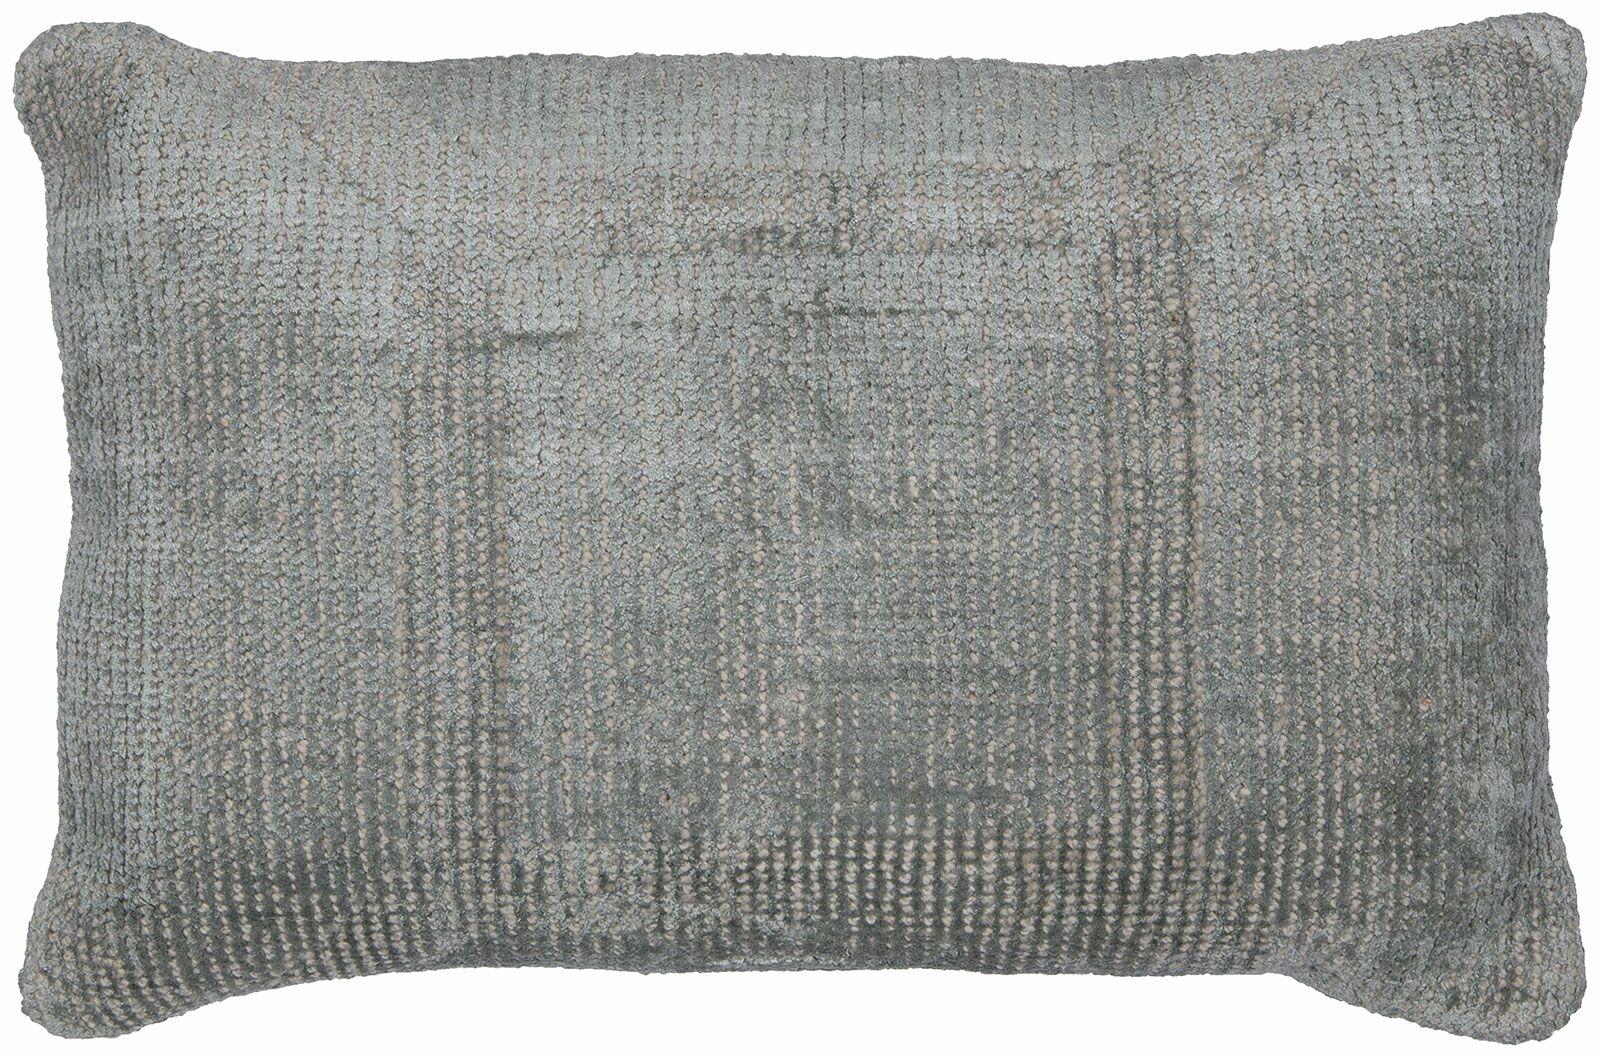 Mowgli Lumbar Pillow